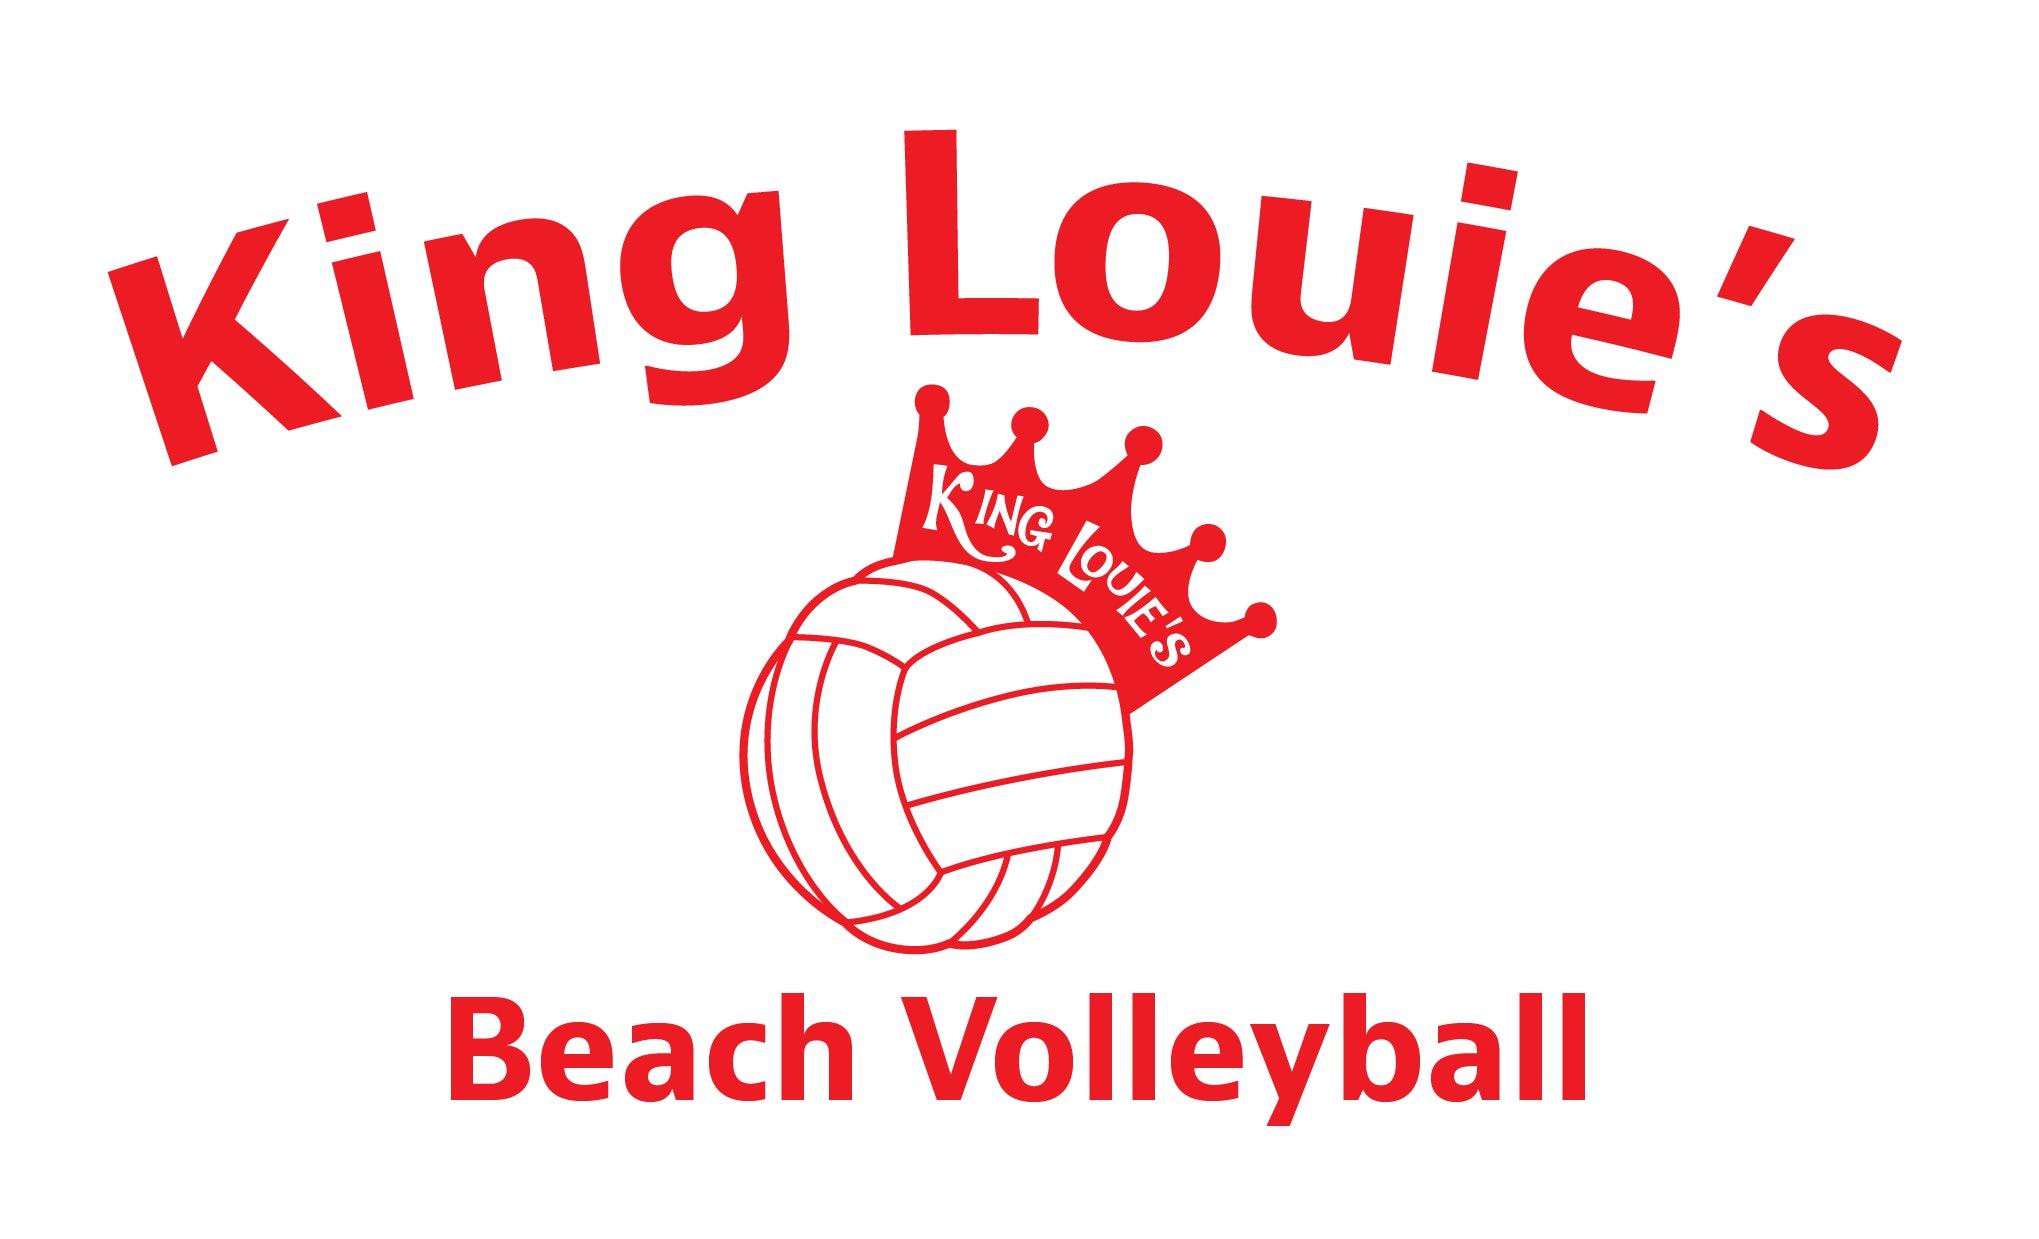 King Louie's Beach Volleyball logo